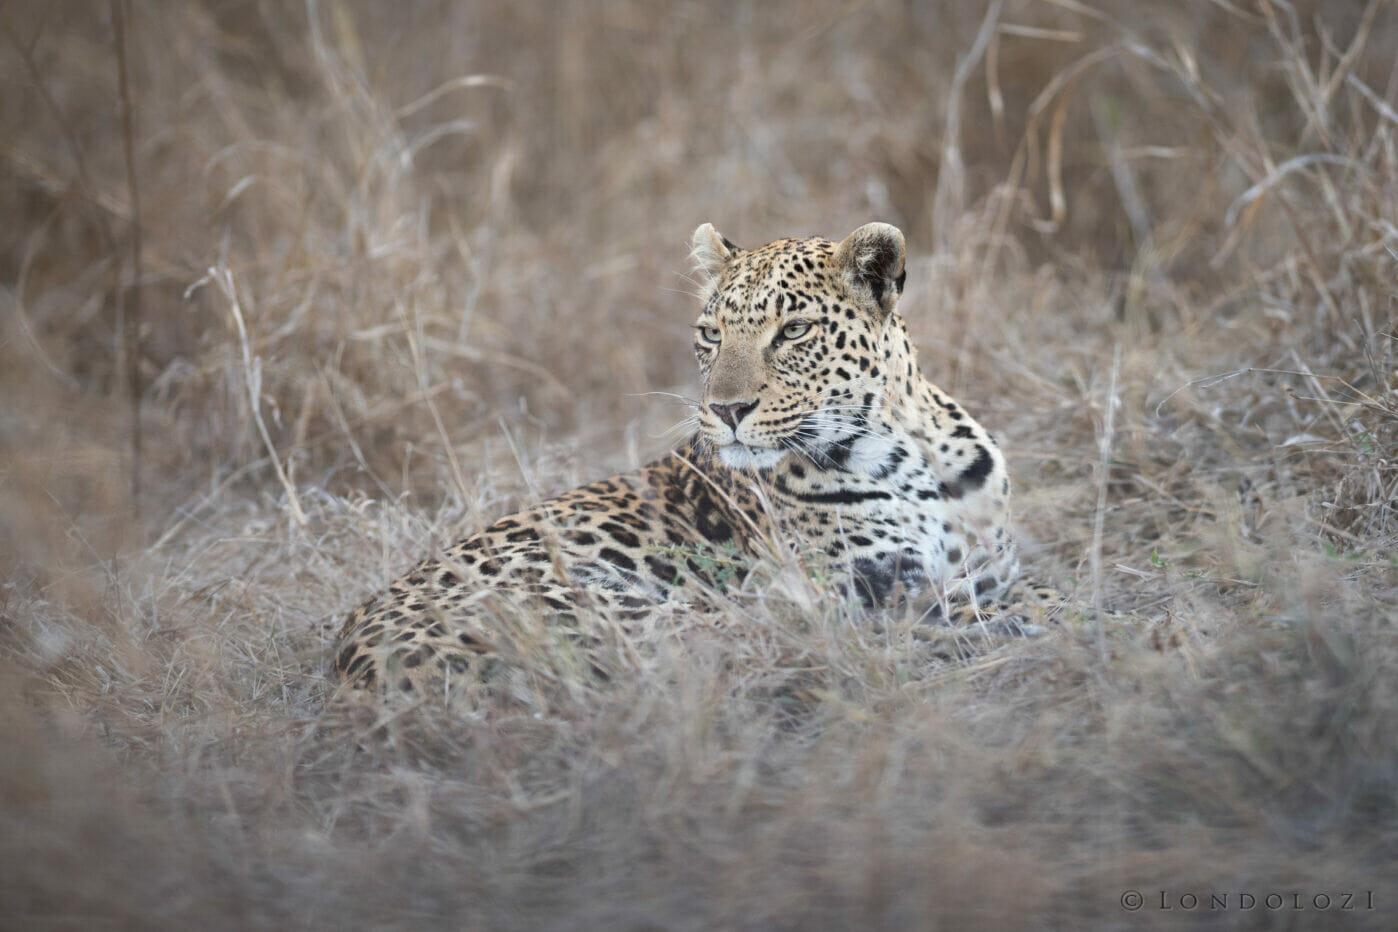 Sdz Ximungwe Female Leopard Dry Grass